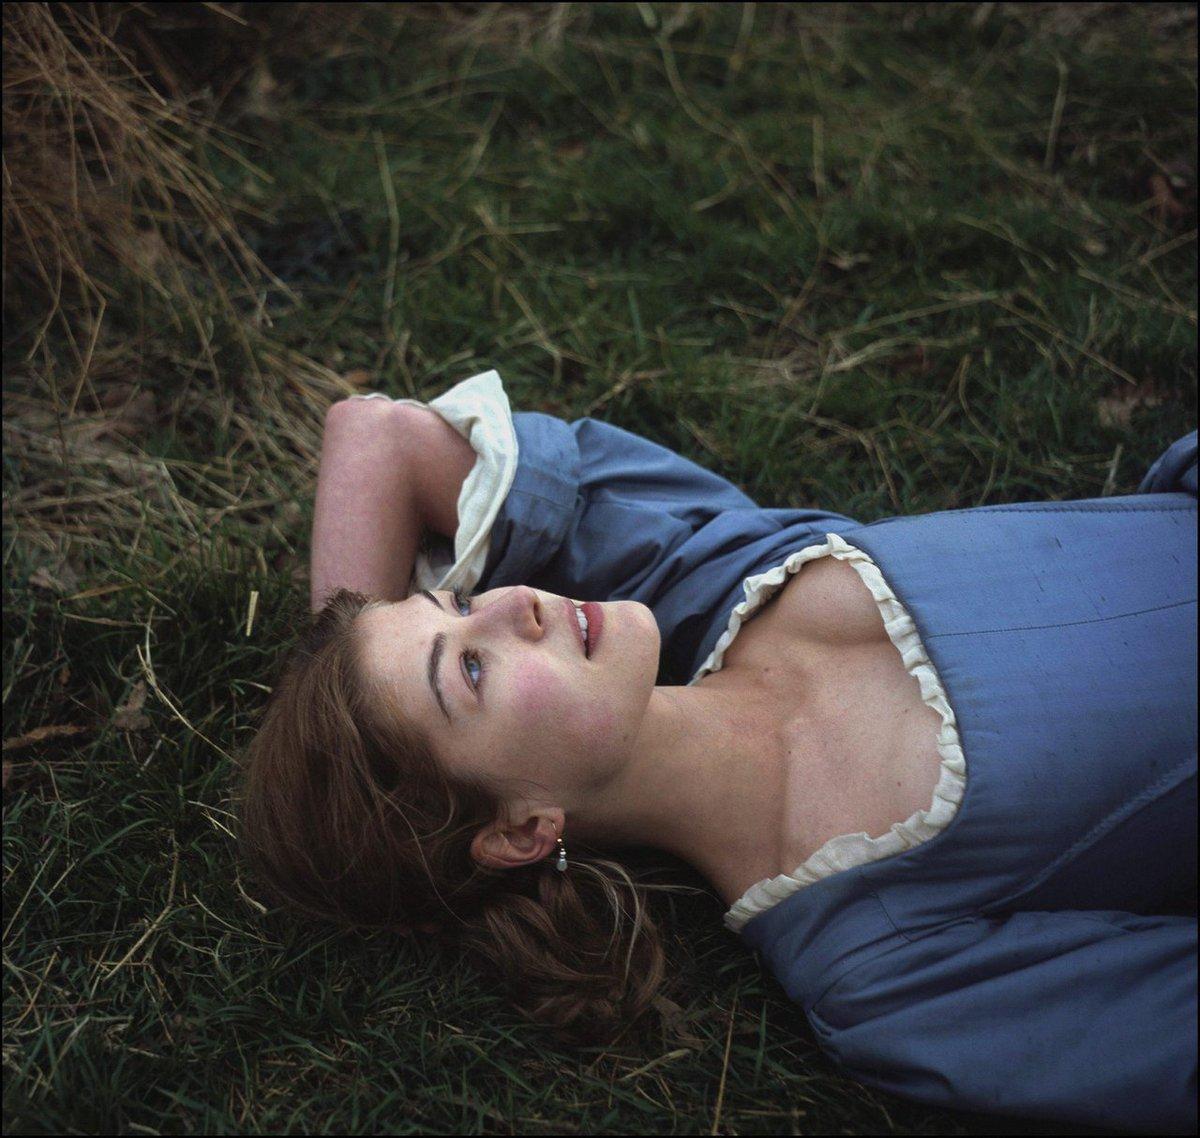 i love you most ardently rosamund pike <br>http://pic.twitter.com/J8KjFCb4re